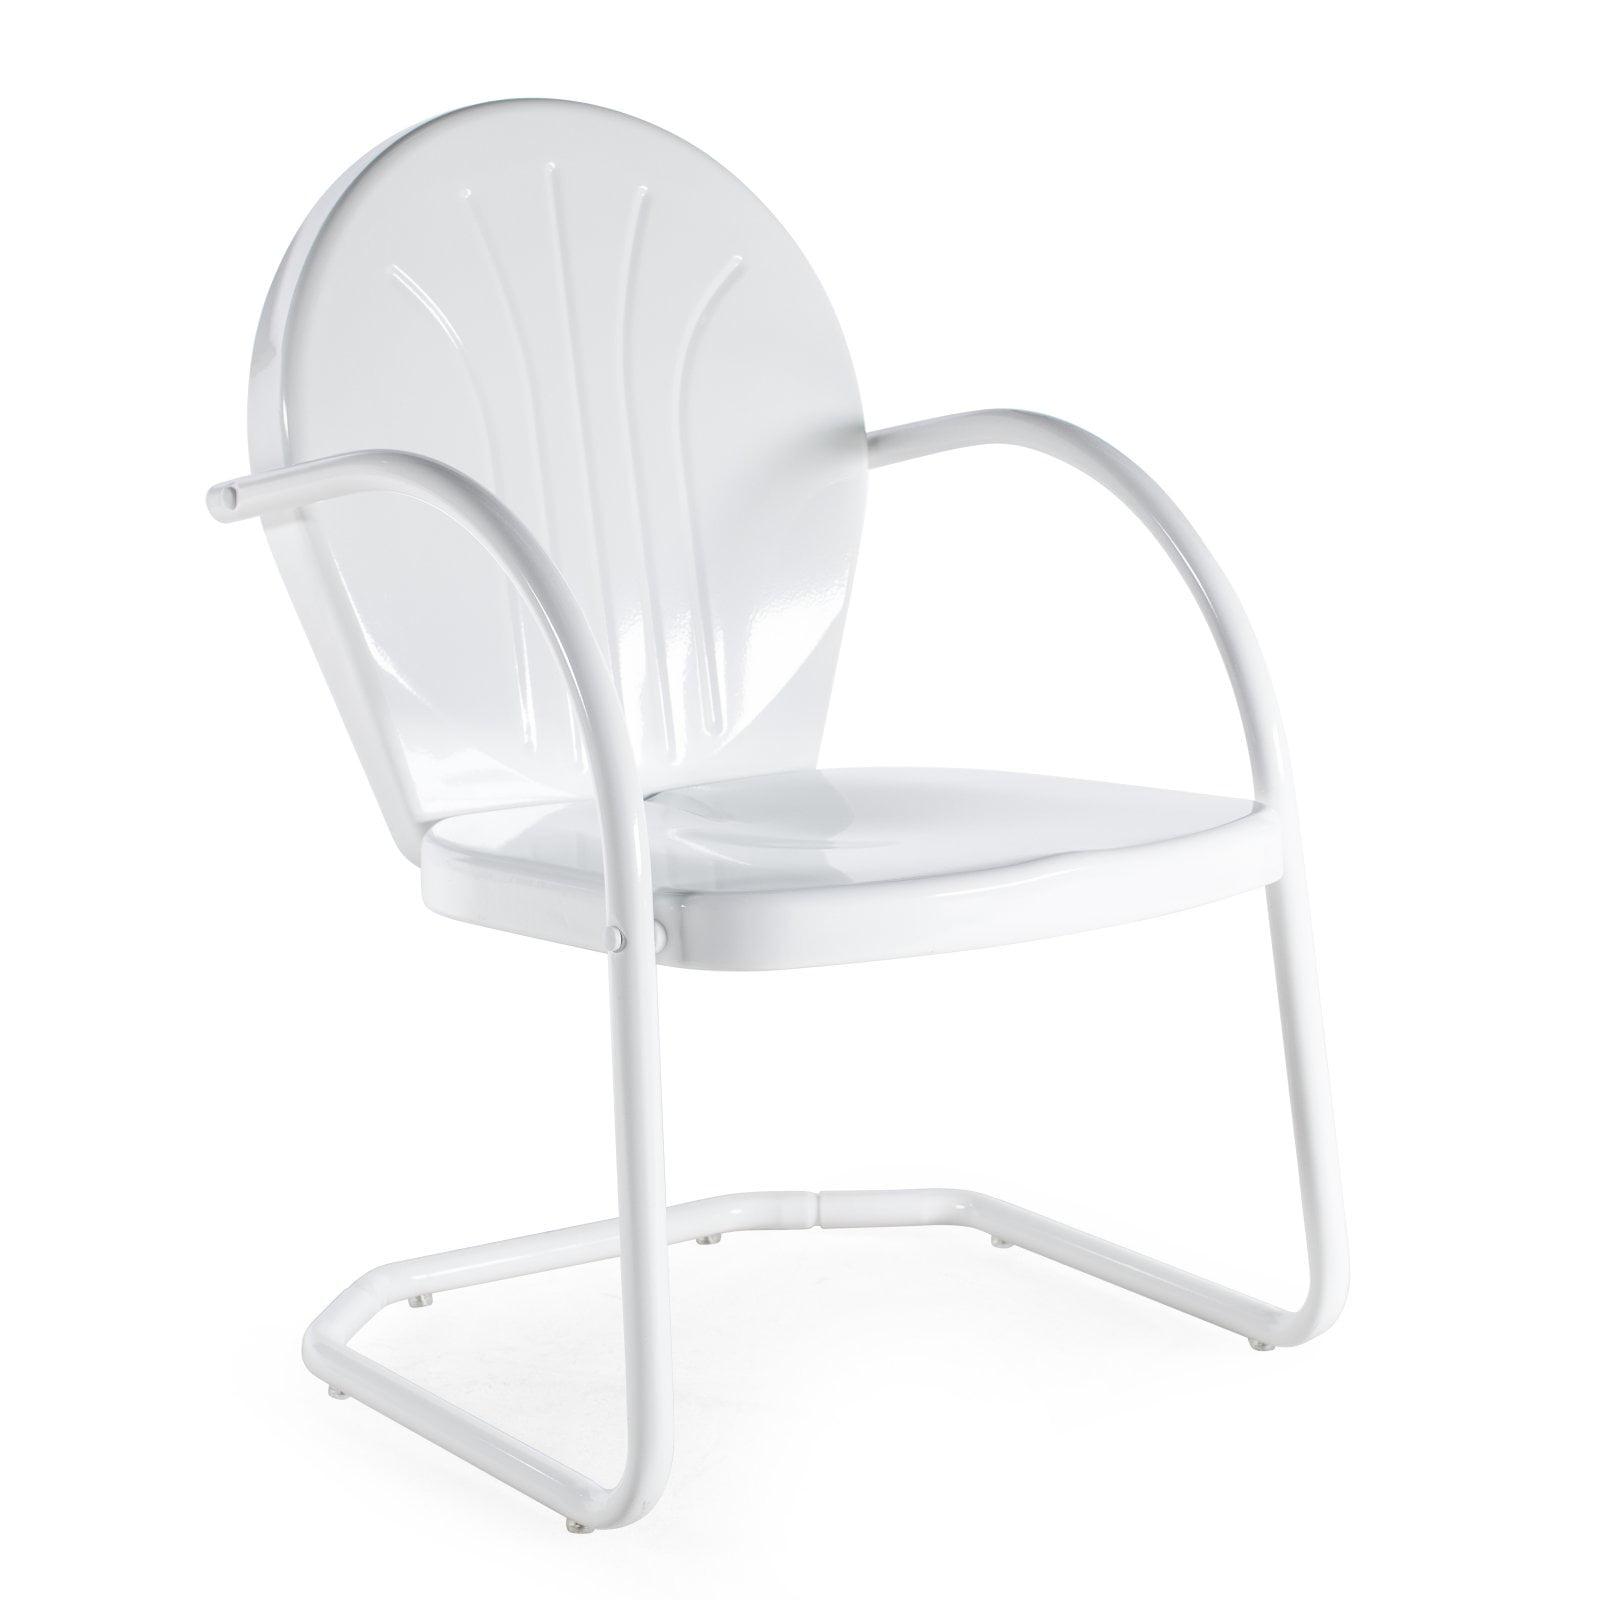 Coral Coast Vintage Retro Chair by